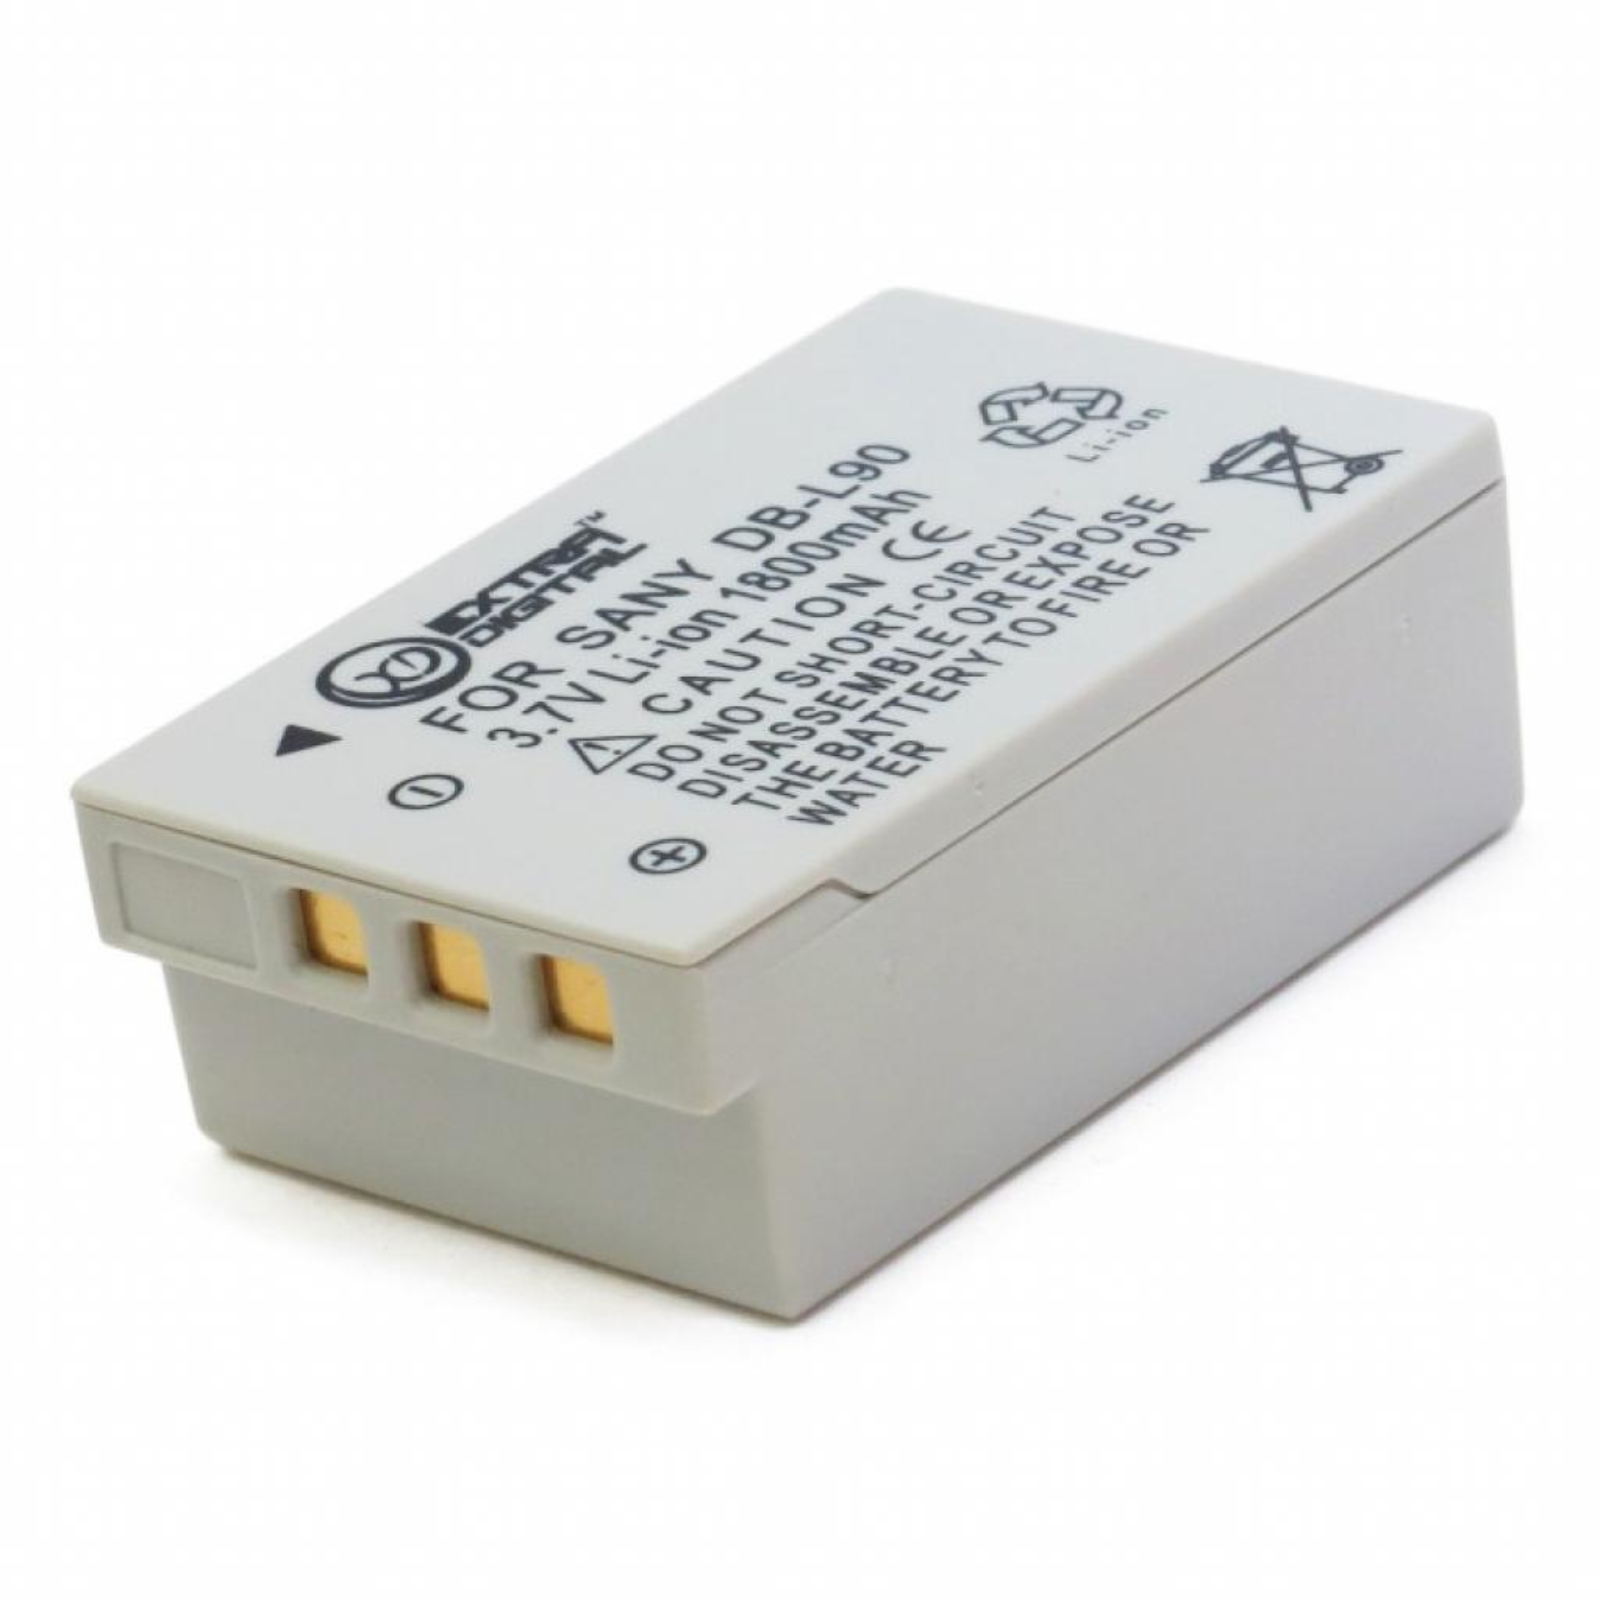 Аккумулятор к фото/видео EXTRADIGITAL Sanyo DB-L90 (DV00DV1267) изображение 2